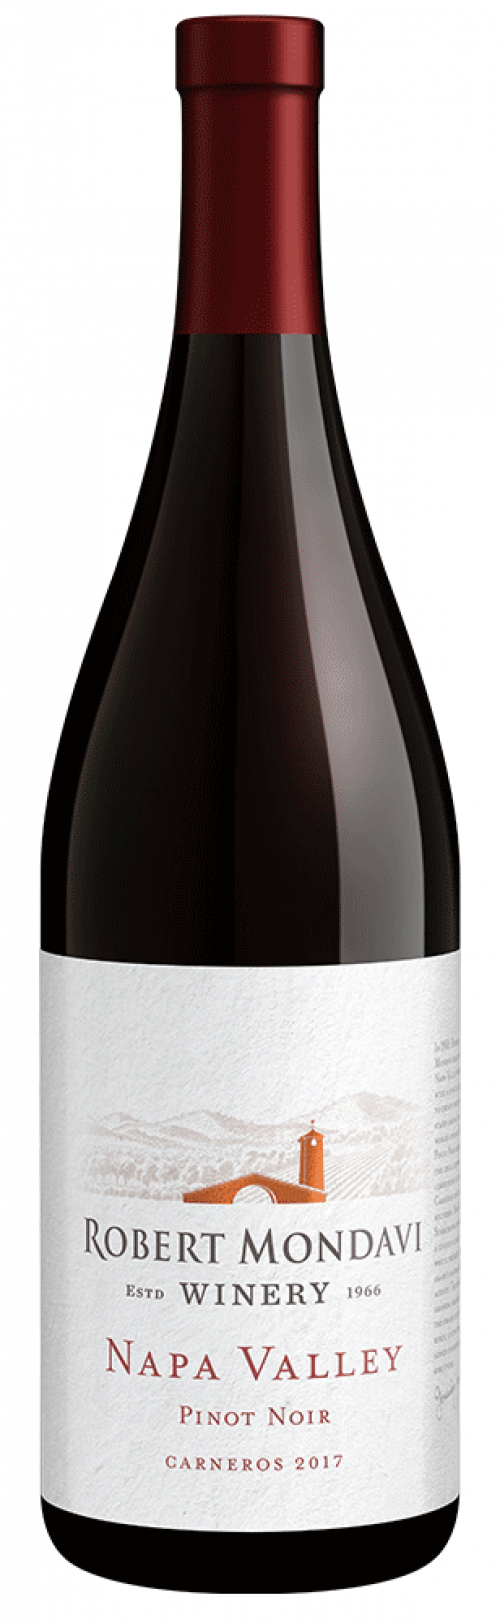 2018 Mondavi Carneros Pinot Noir 750ml